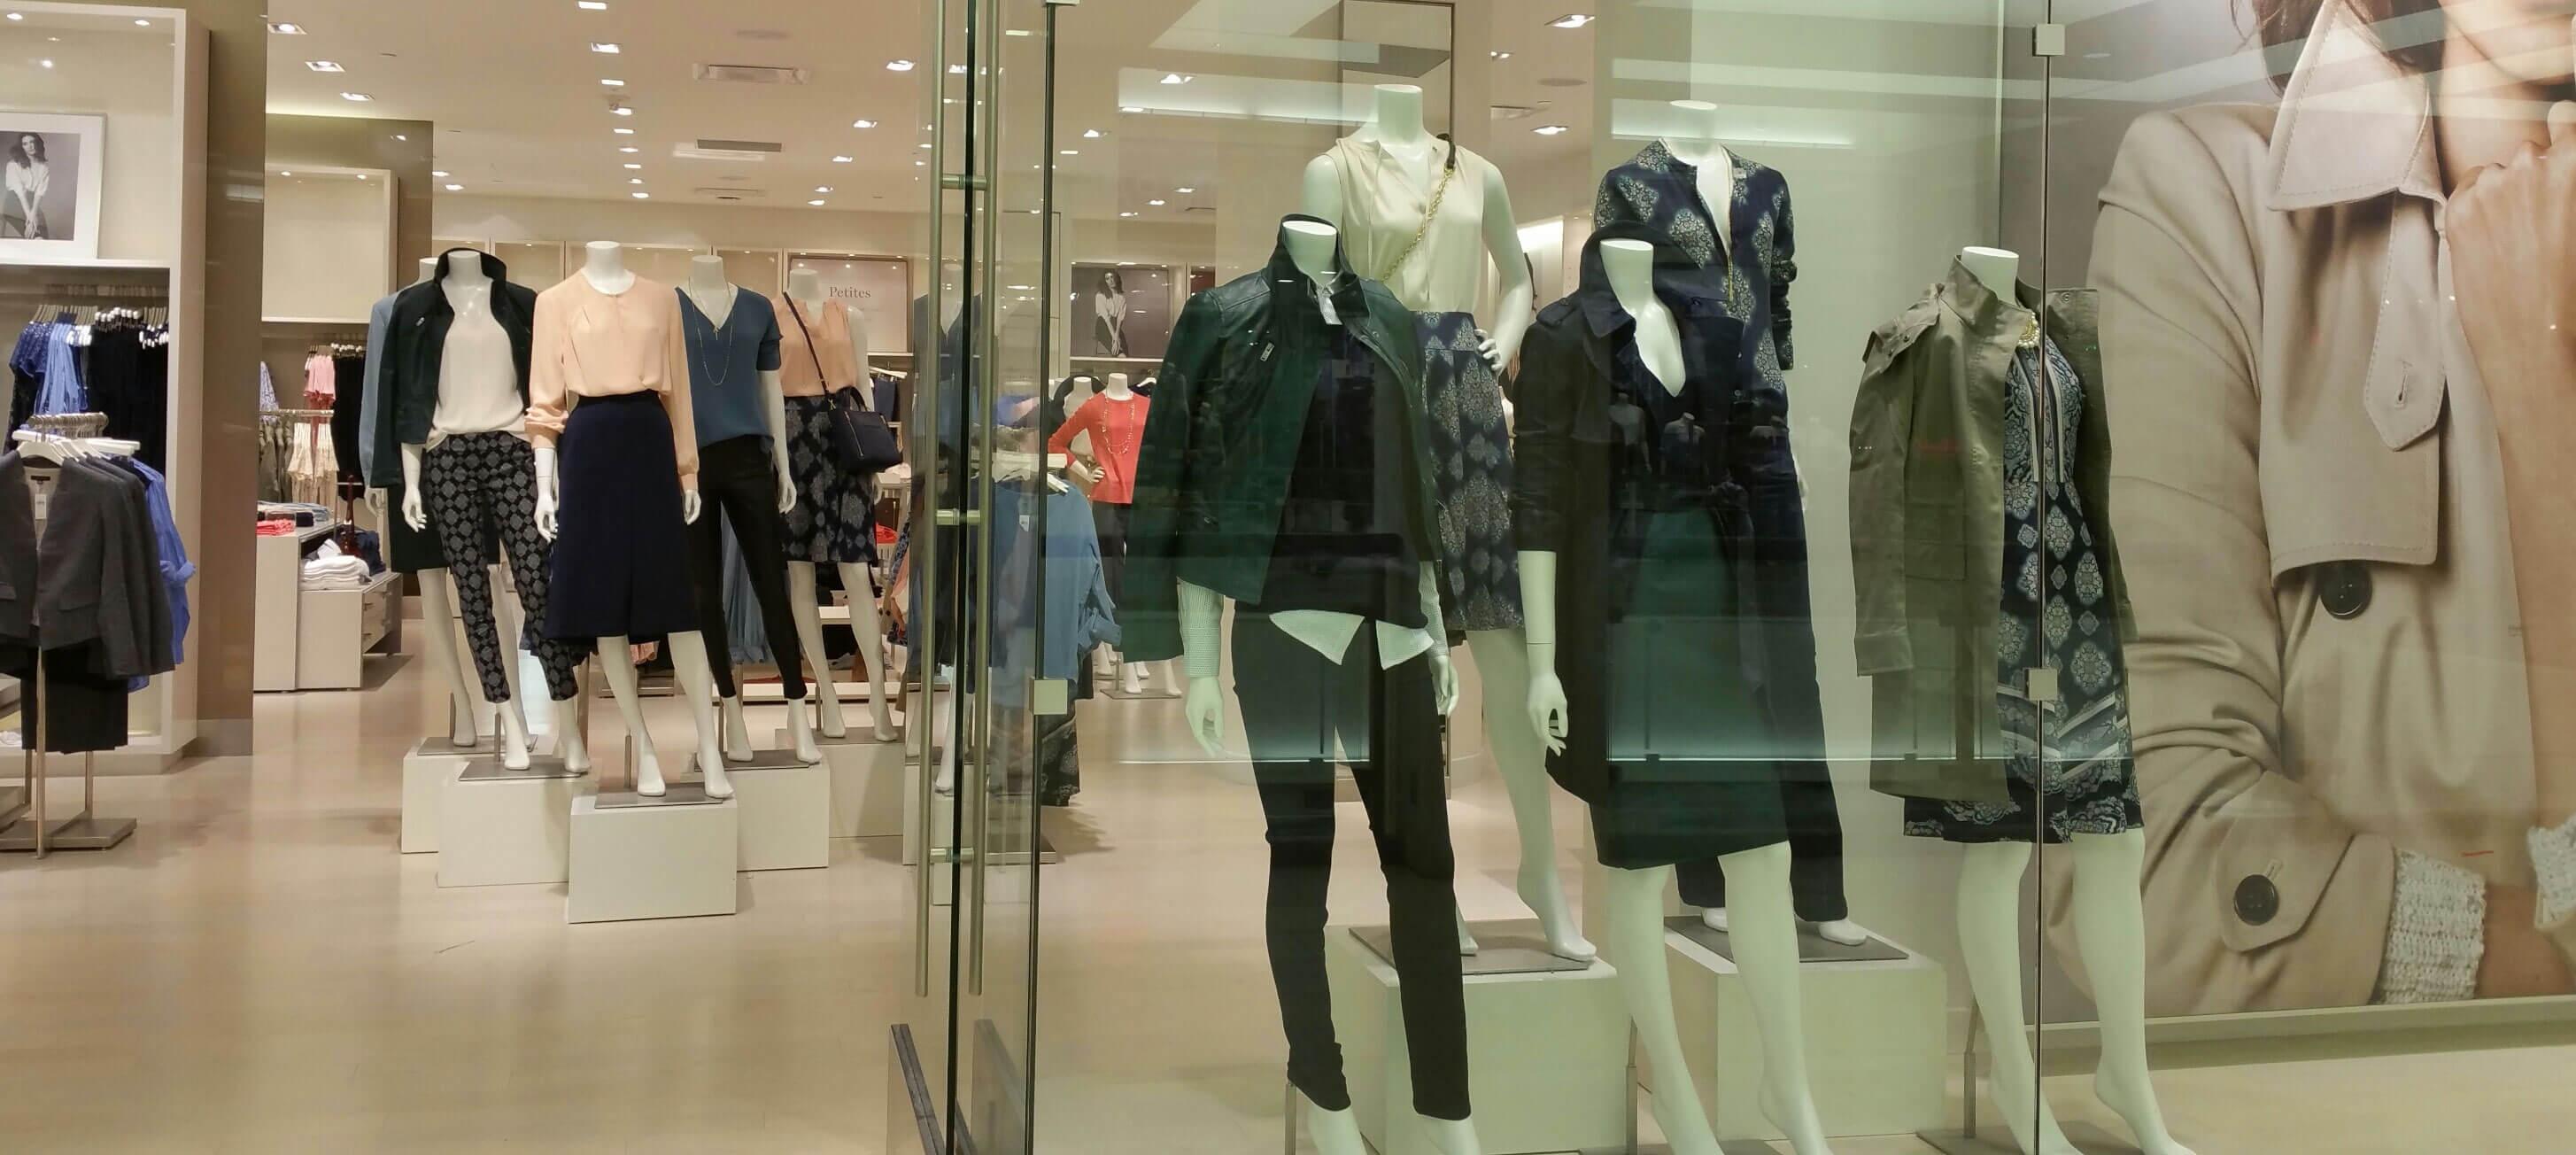 Retail Store POS